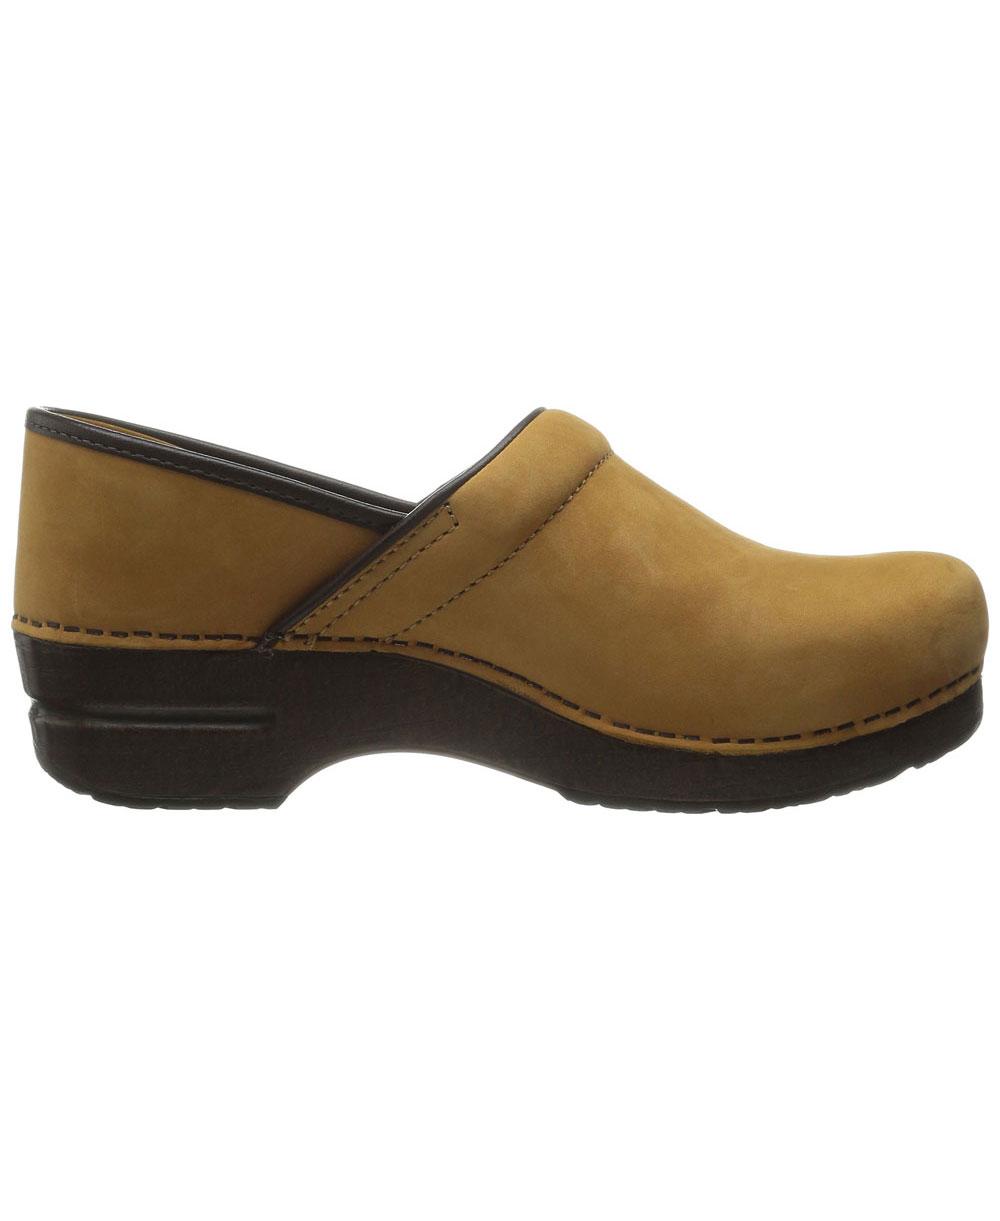 Professional Leather Zuecos de Piel para Mujer Wheat Nubuck